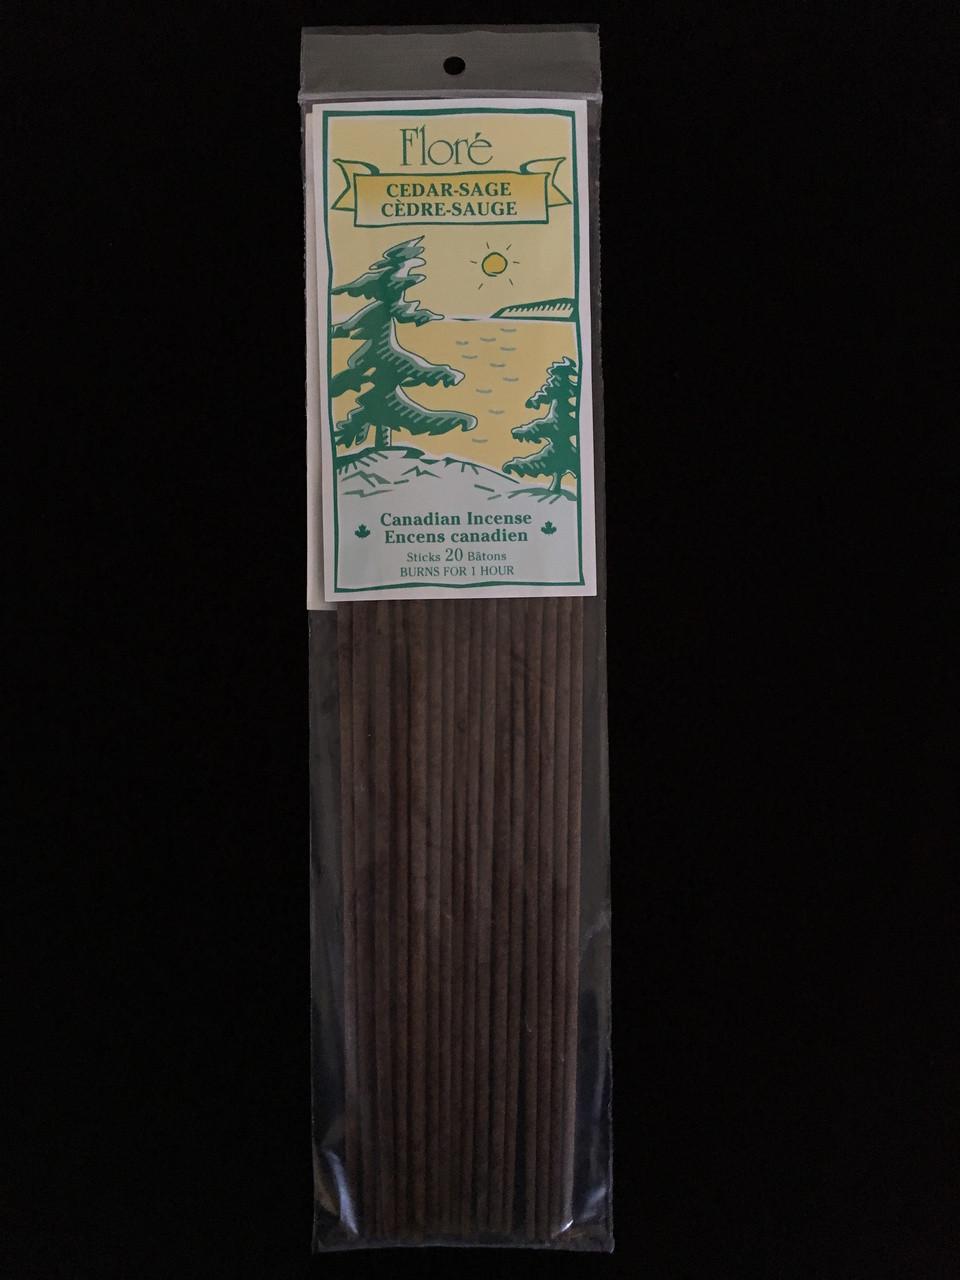 Cedar-Sage